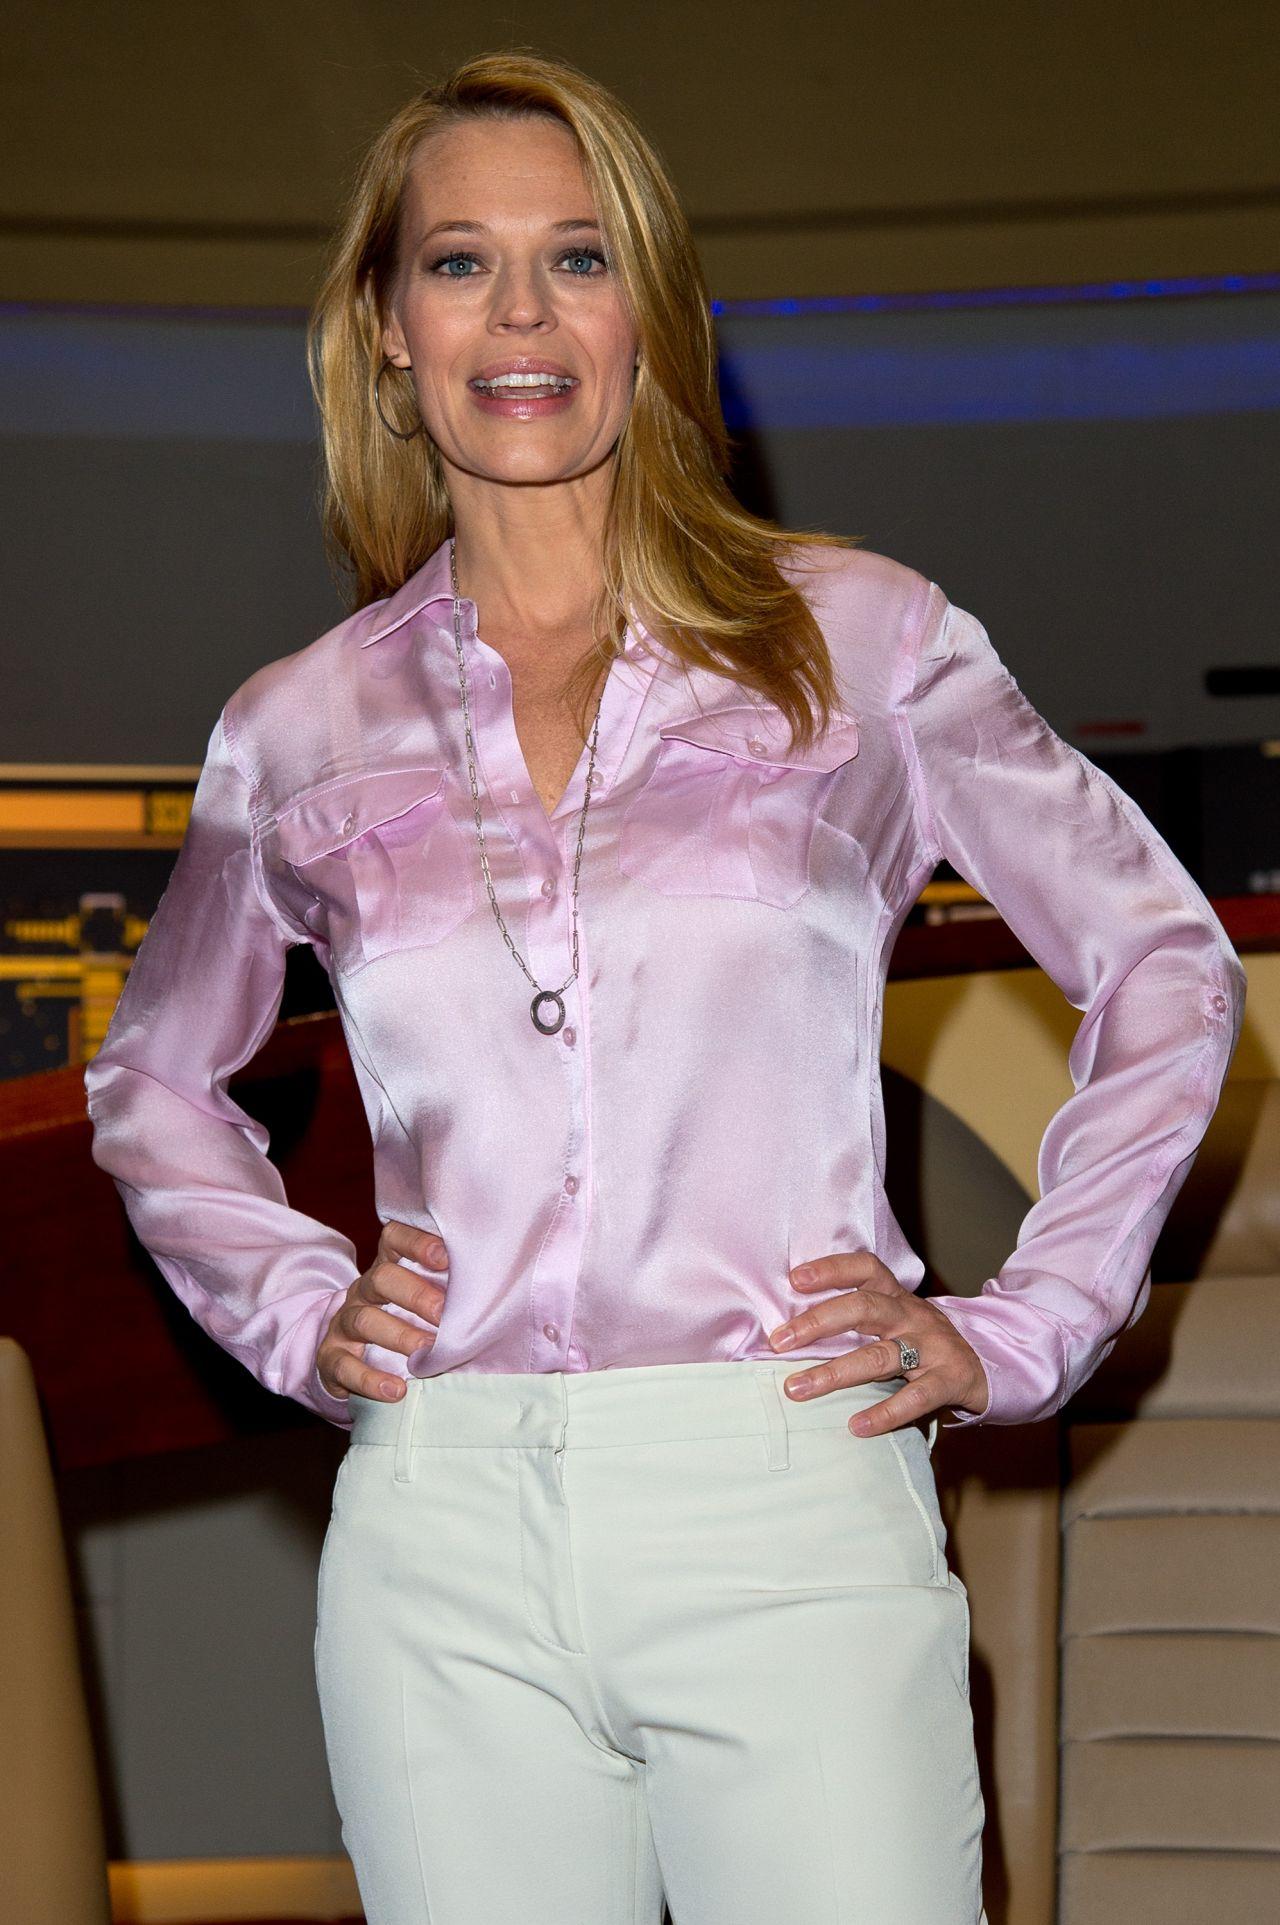 Jeri Ryana And Marina Sirtis - Destination Star Trek Event At Excel In London, Oct 2014-7935